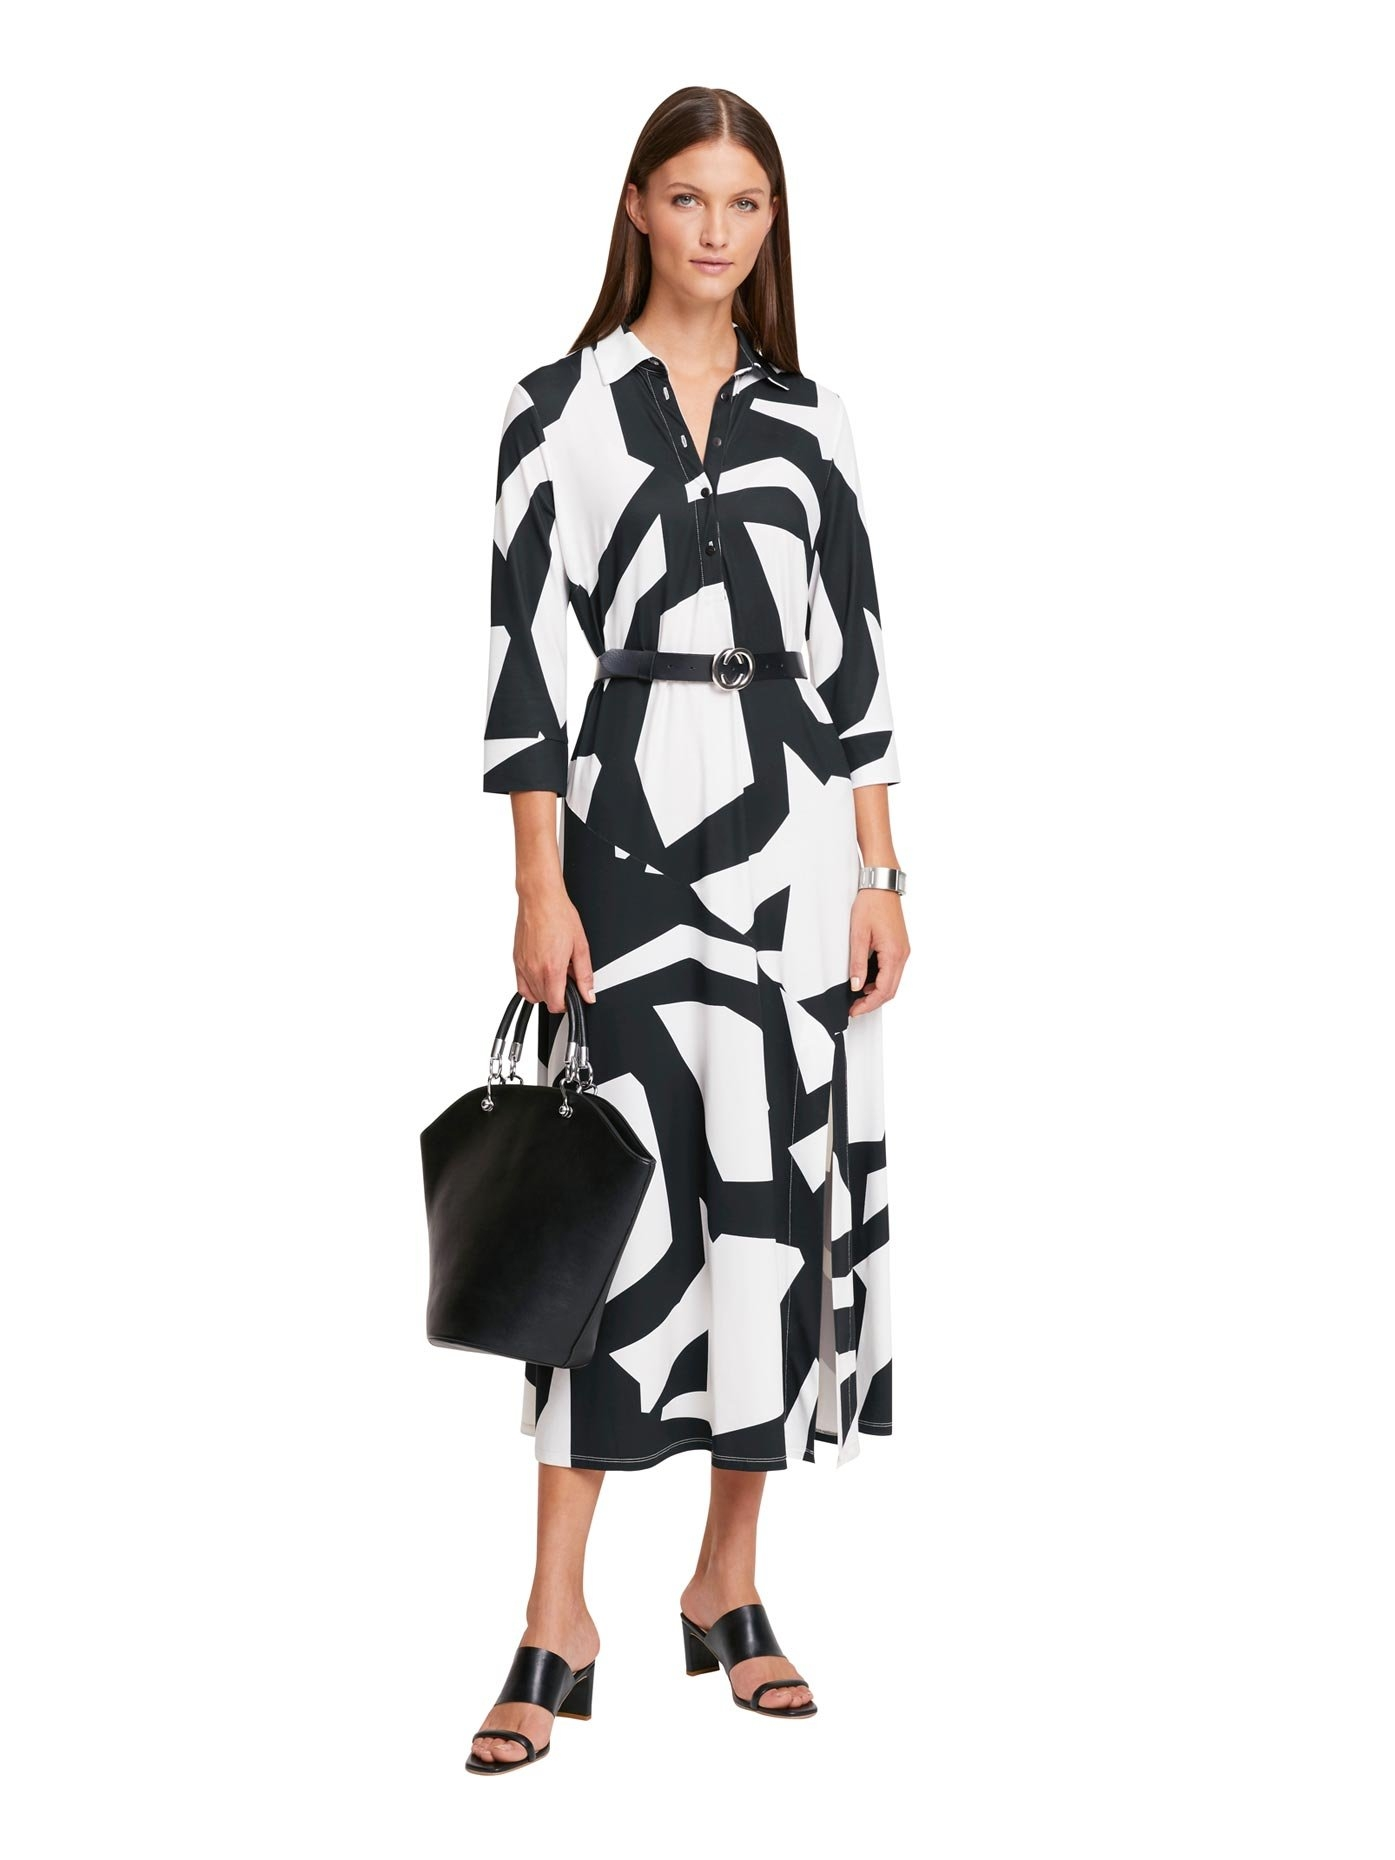 RICK CARDONA by Heine gedessineerde jurk voordelig en veilig online kopen